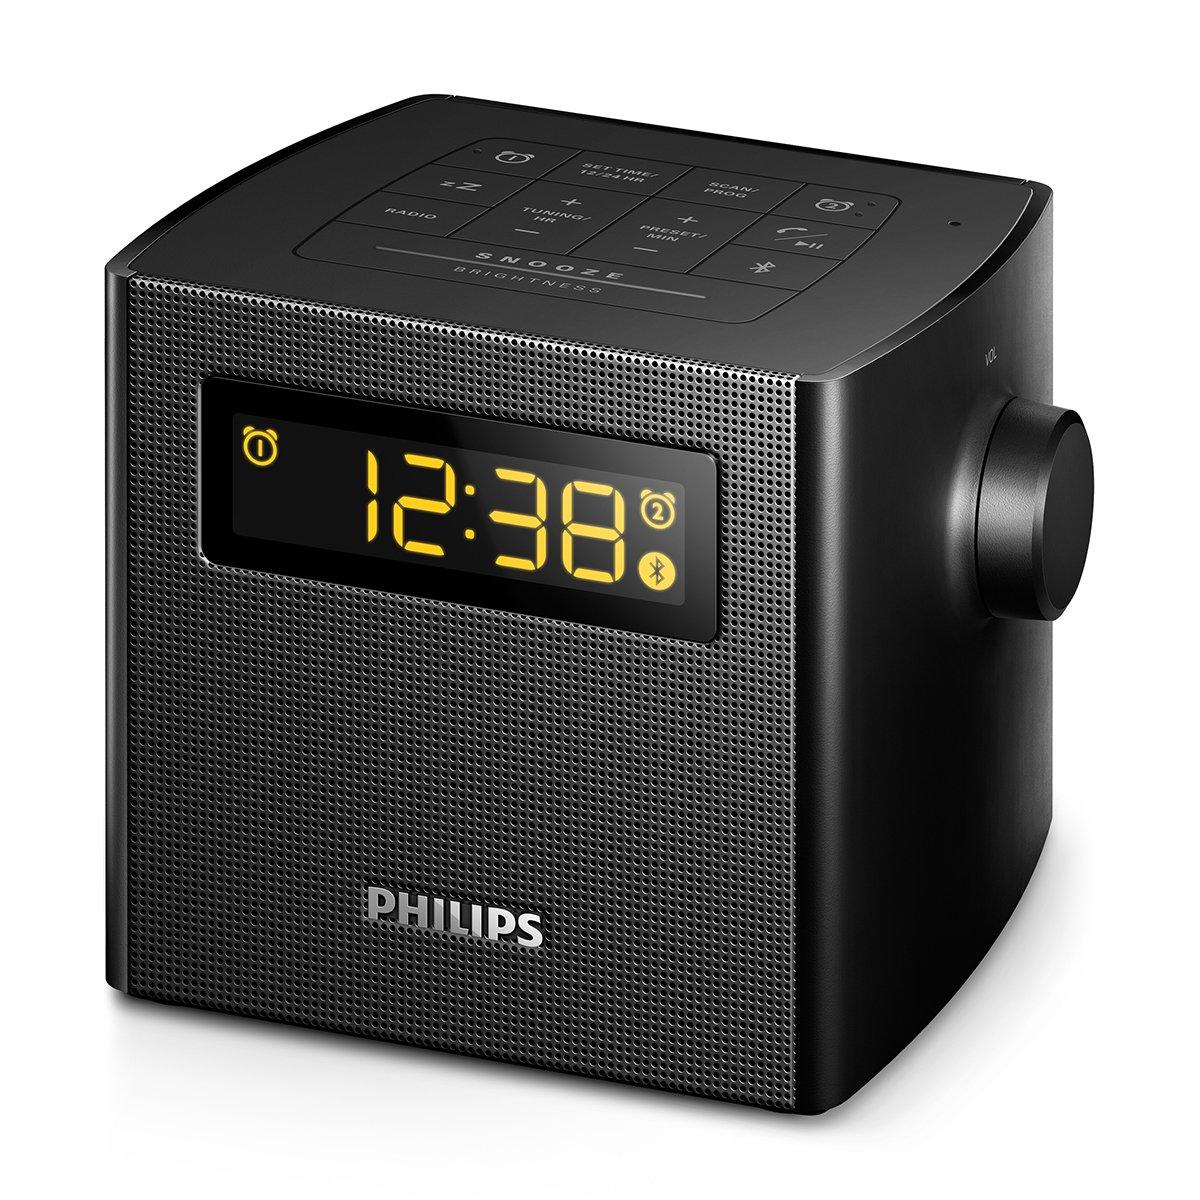 Philips AJT4400B/37 - Radio (Reloj, Digital, FM, 87,5-108 MHz, 2 W, LED): Amazon.es: Electrónica